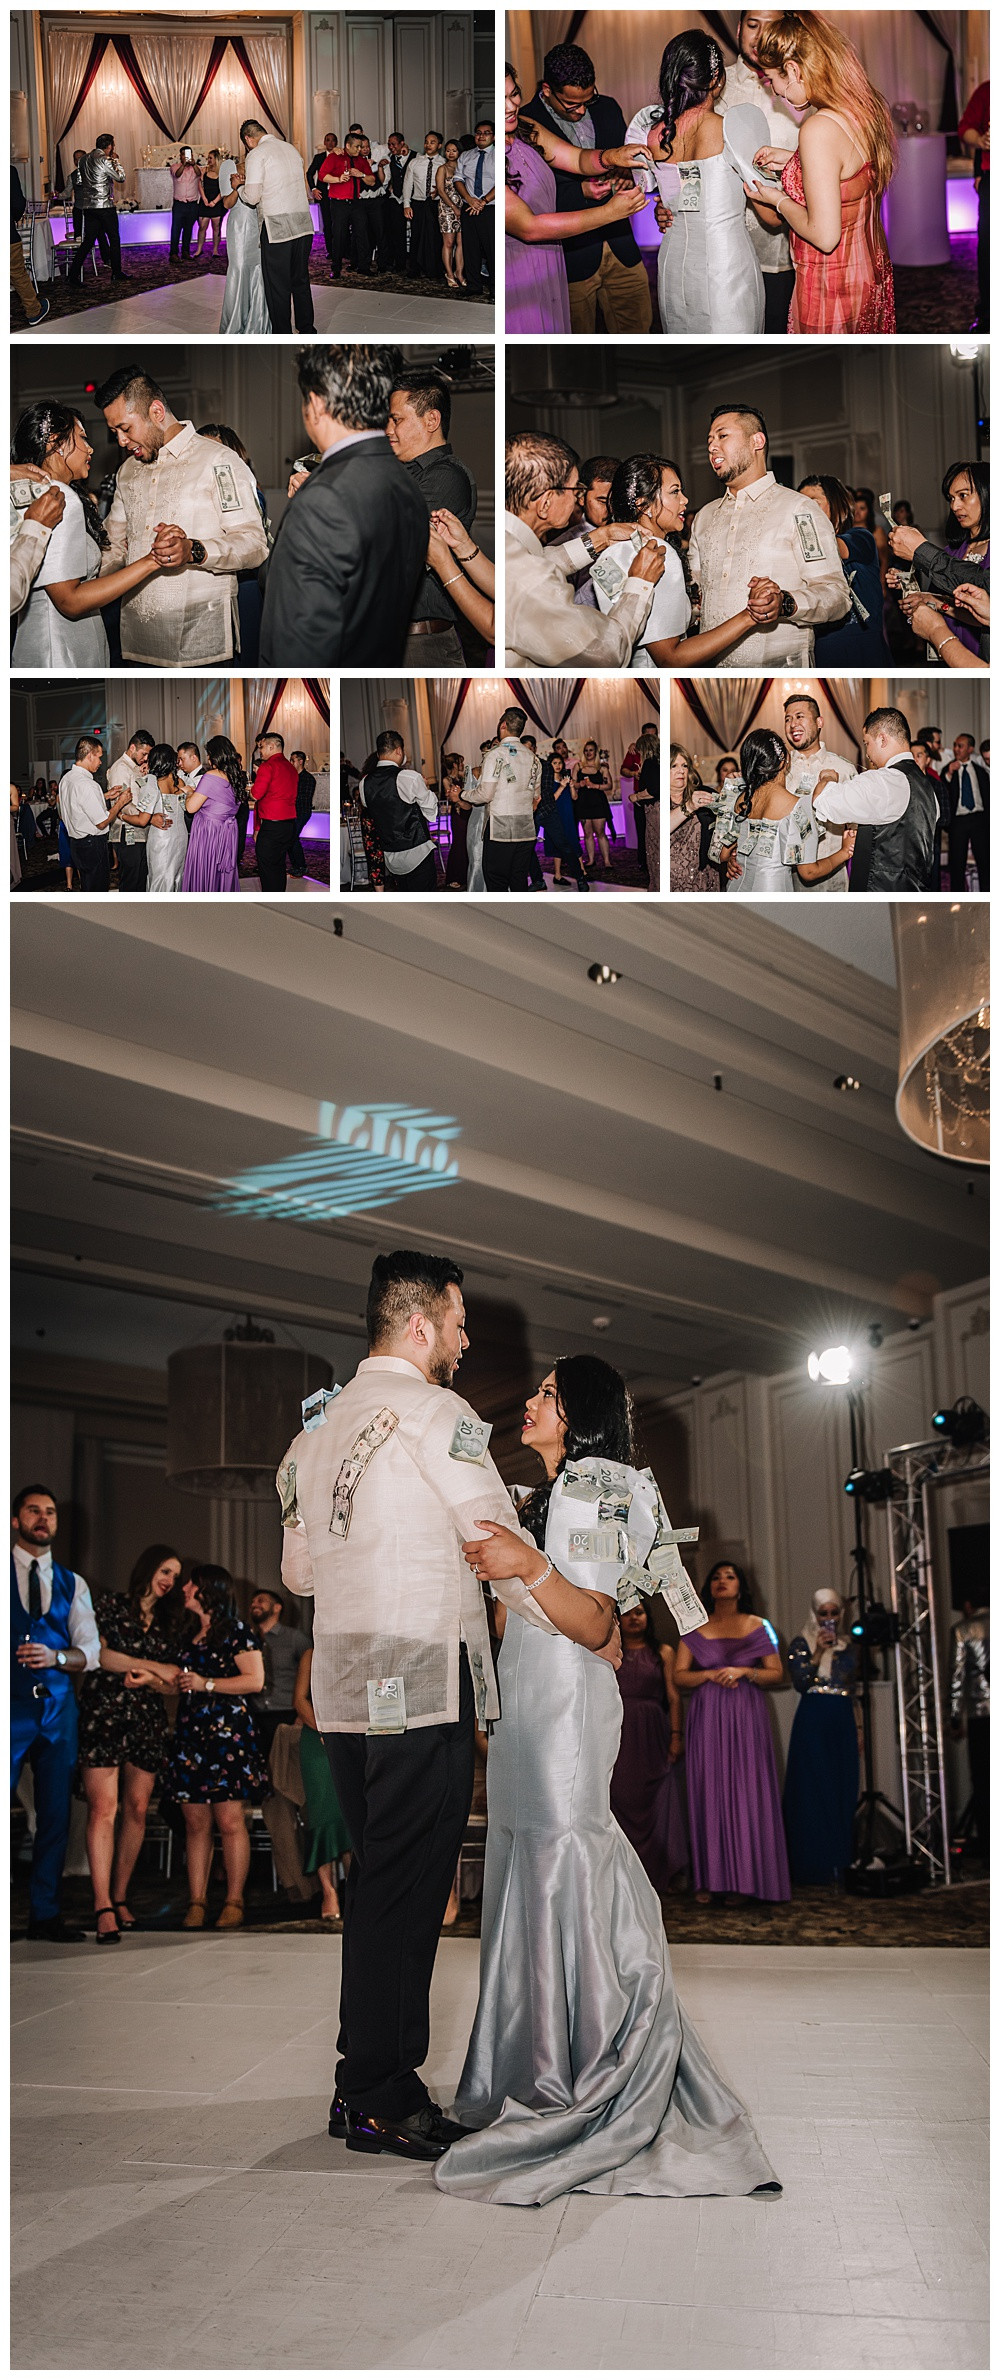 Traditional Money Dance